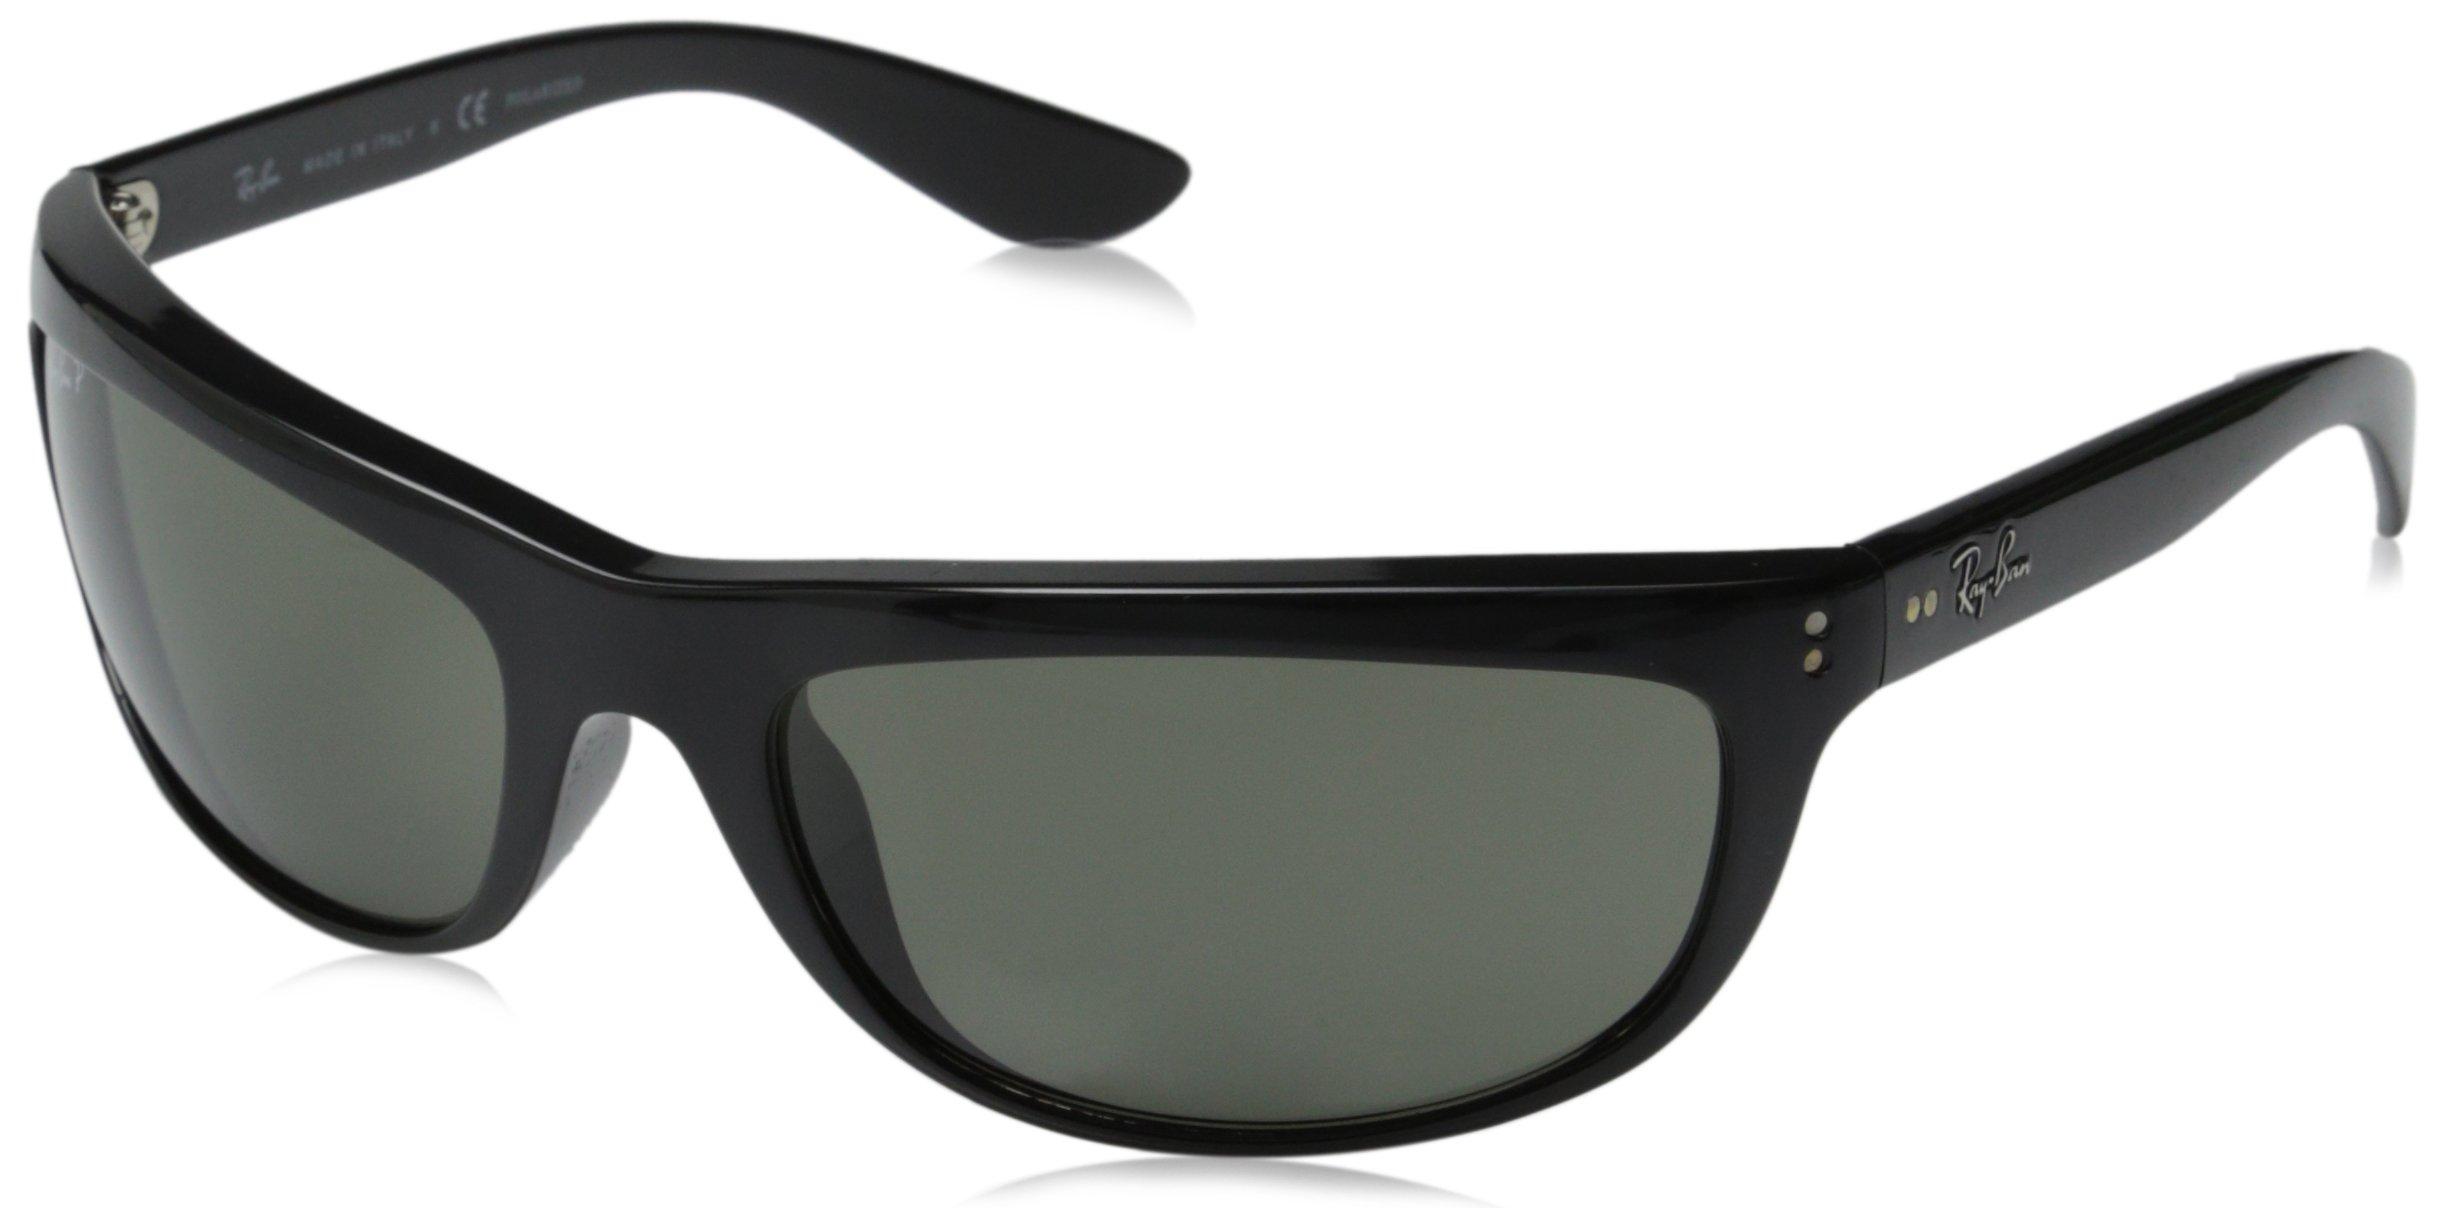 Ray-Ban Sunglasses RB4089 Balorama  Frame: Black Lens: Crystal Green Polarized